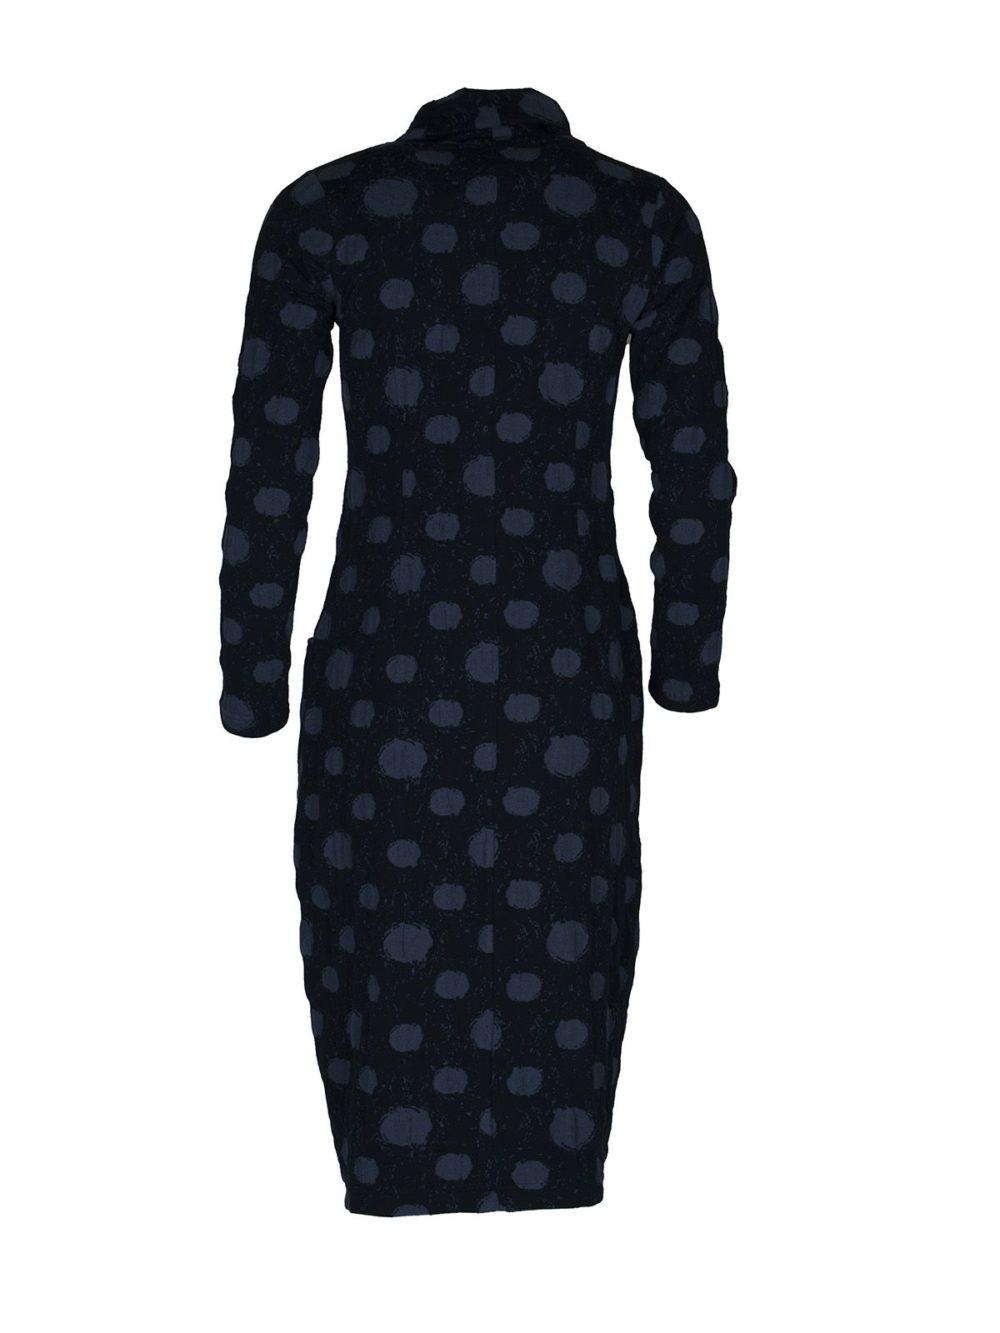 CLD 2315 B Dress Capri